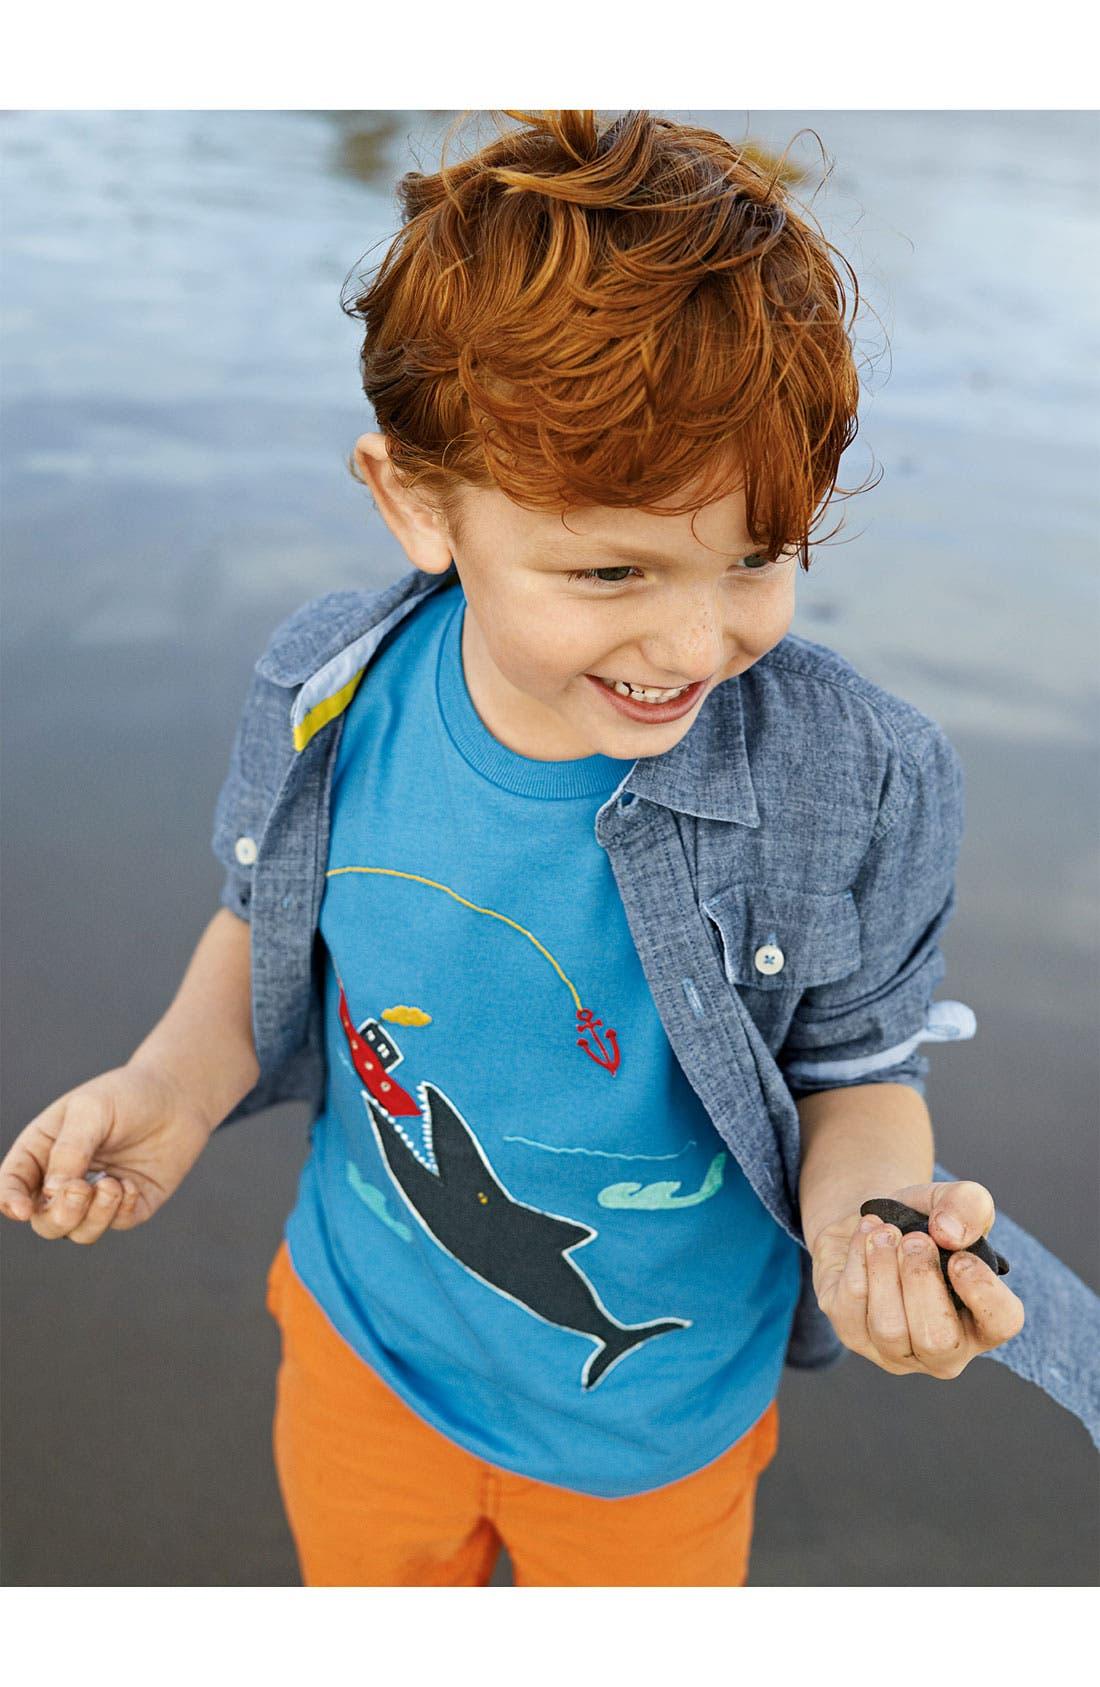 Main Image - Mini Boden T-Shirt, Woven Shirt & Chinos (Toddler, Little Boys & Big Boys)